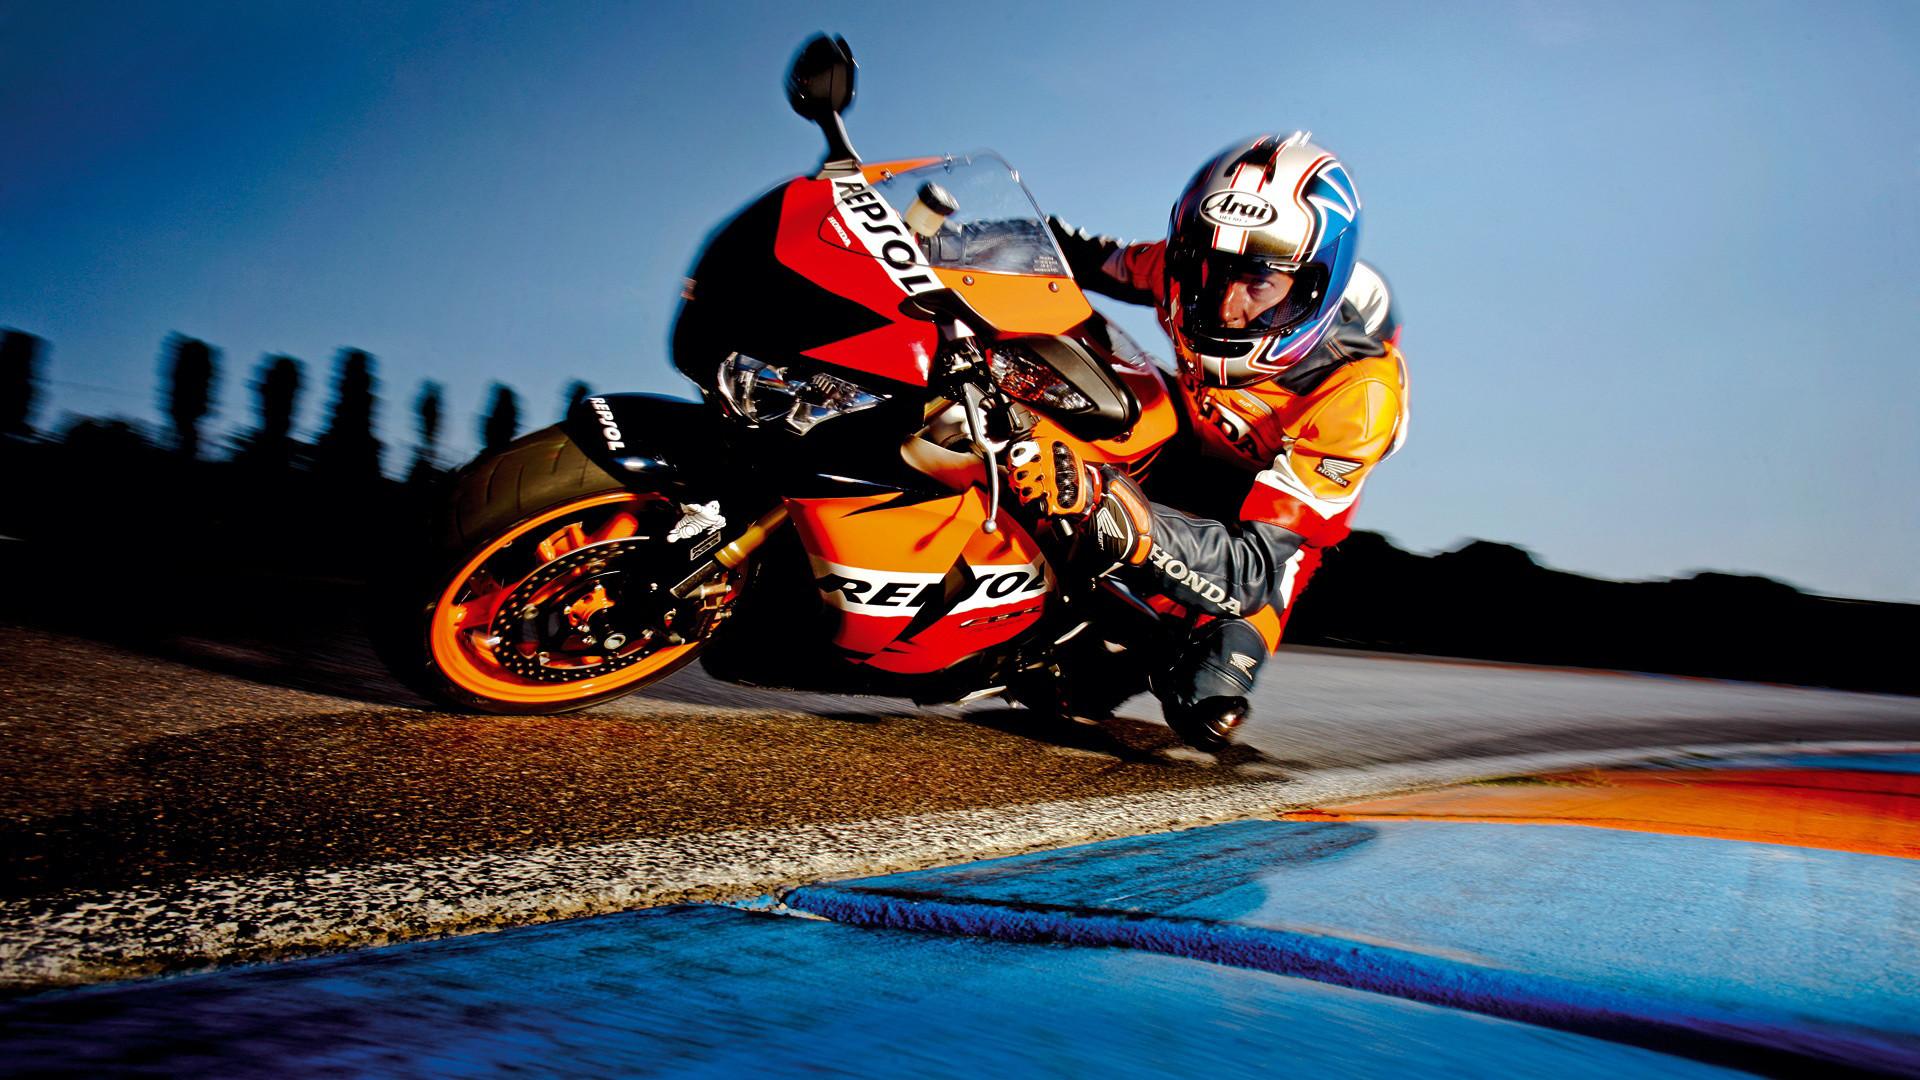 Res: 1920x1080, Honda CBR1000RR Fireblade Repsol 02 HD. Â«Â«